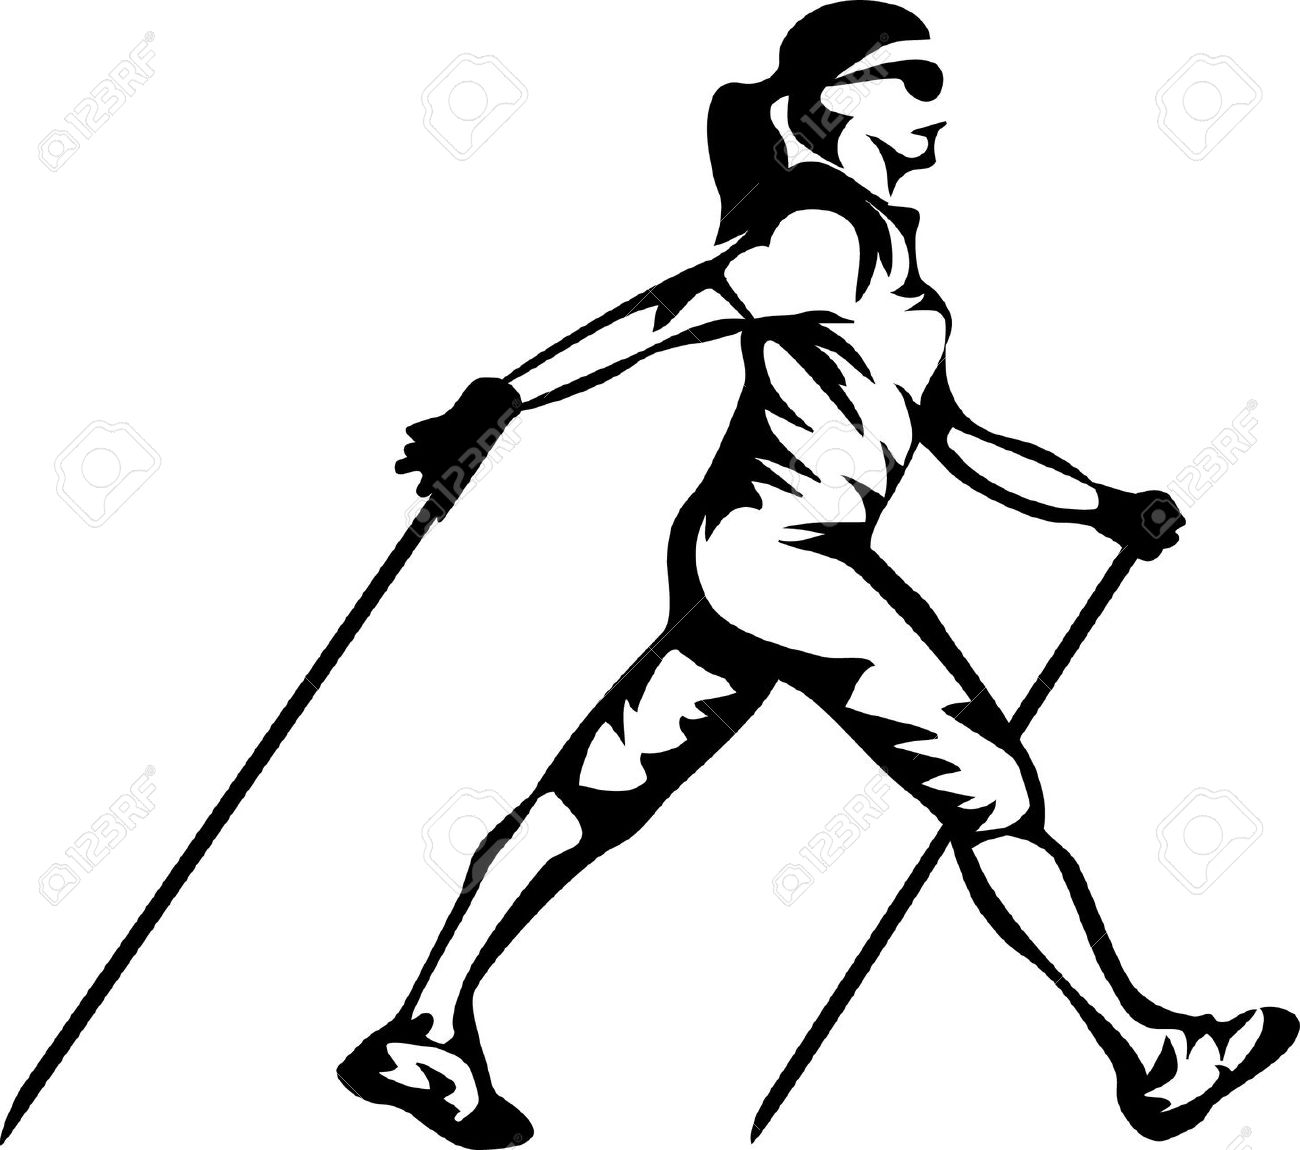 Nordic Walking Clipart